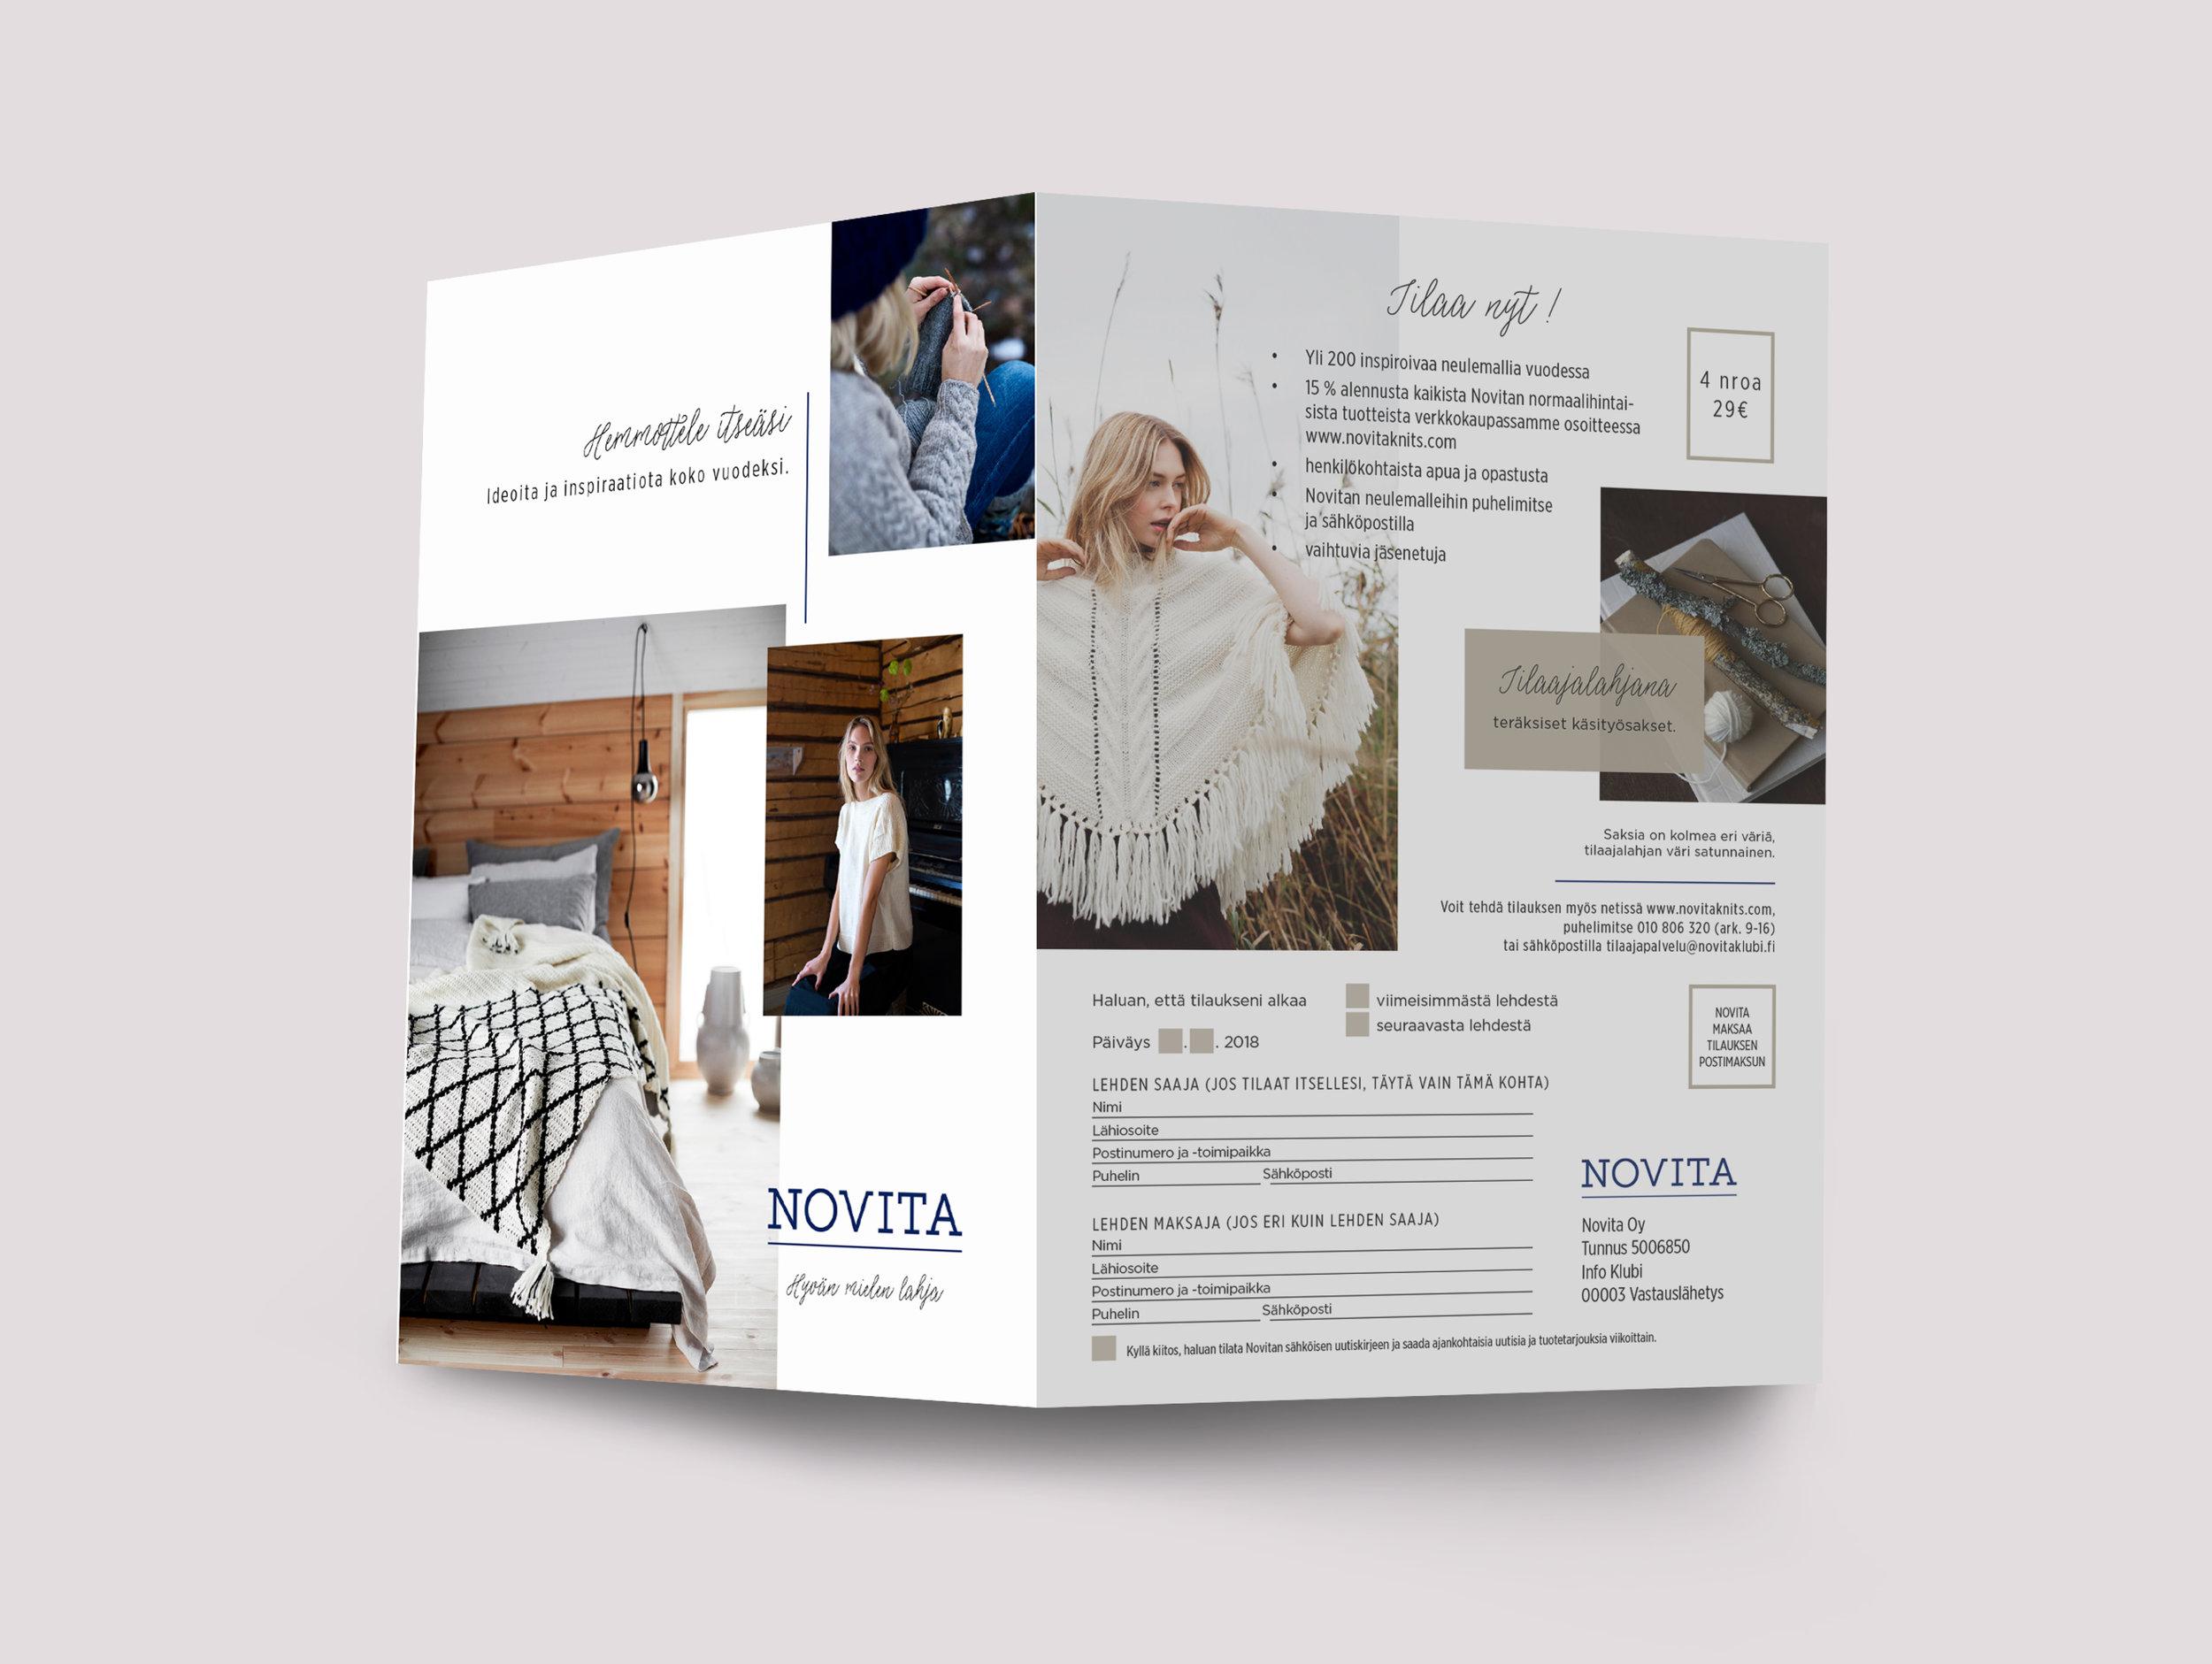 Novita_flyer_front.jpg